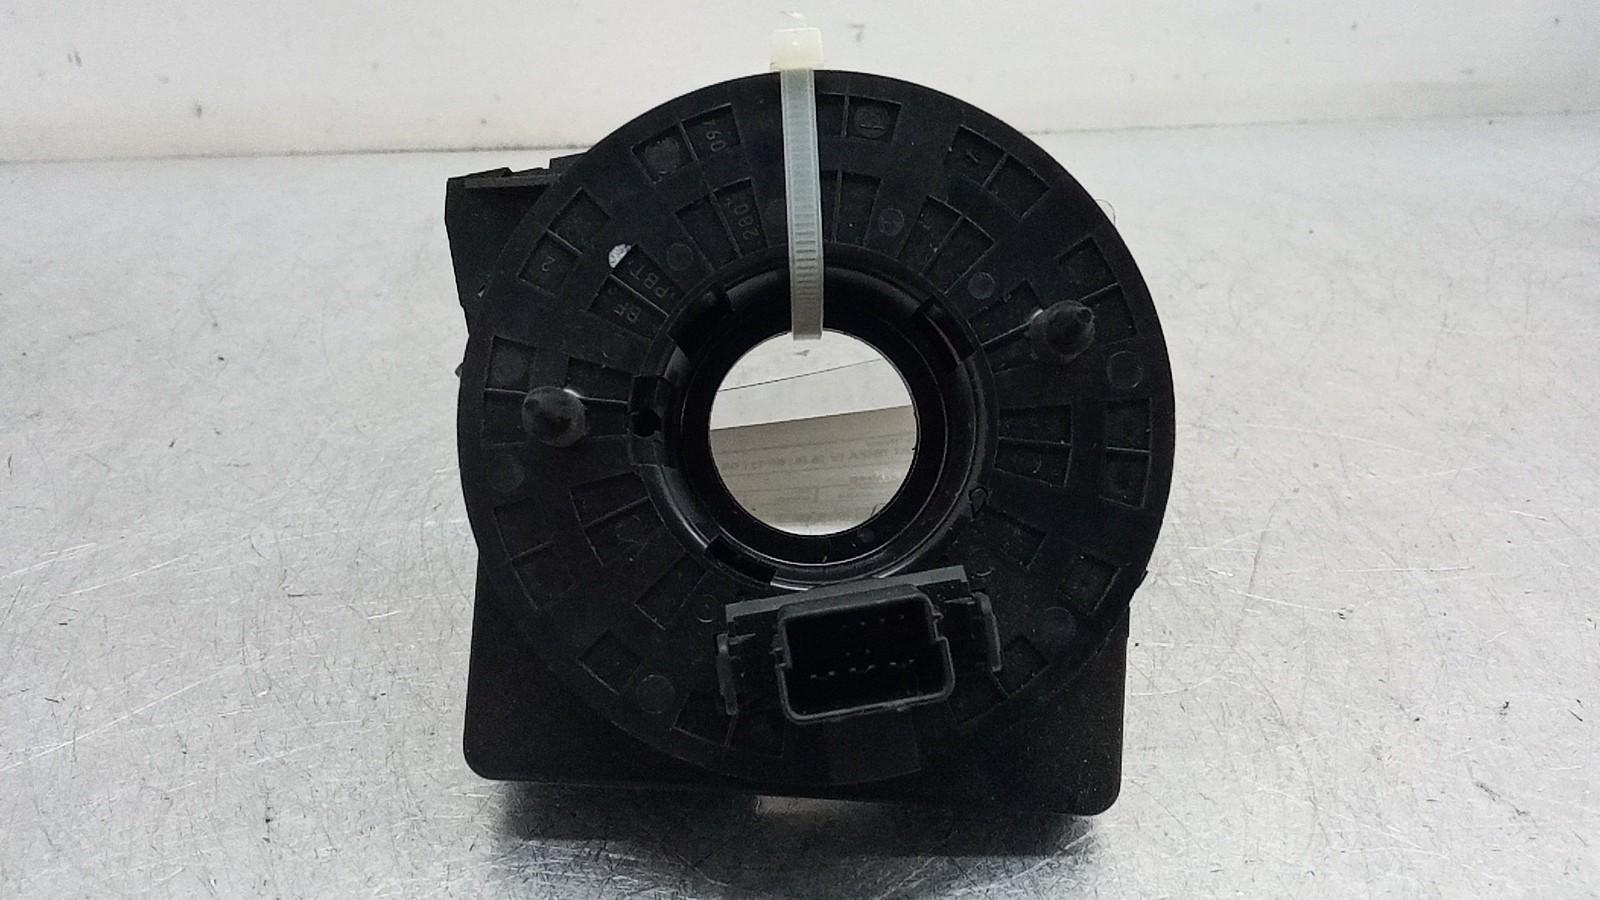 Fita Airbag (20411211).